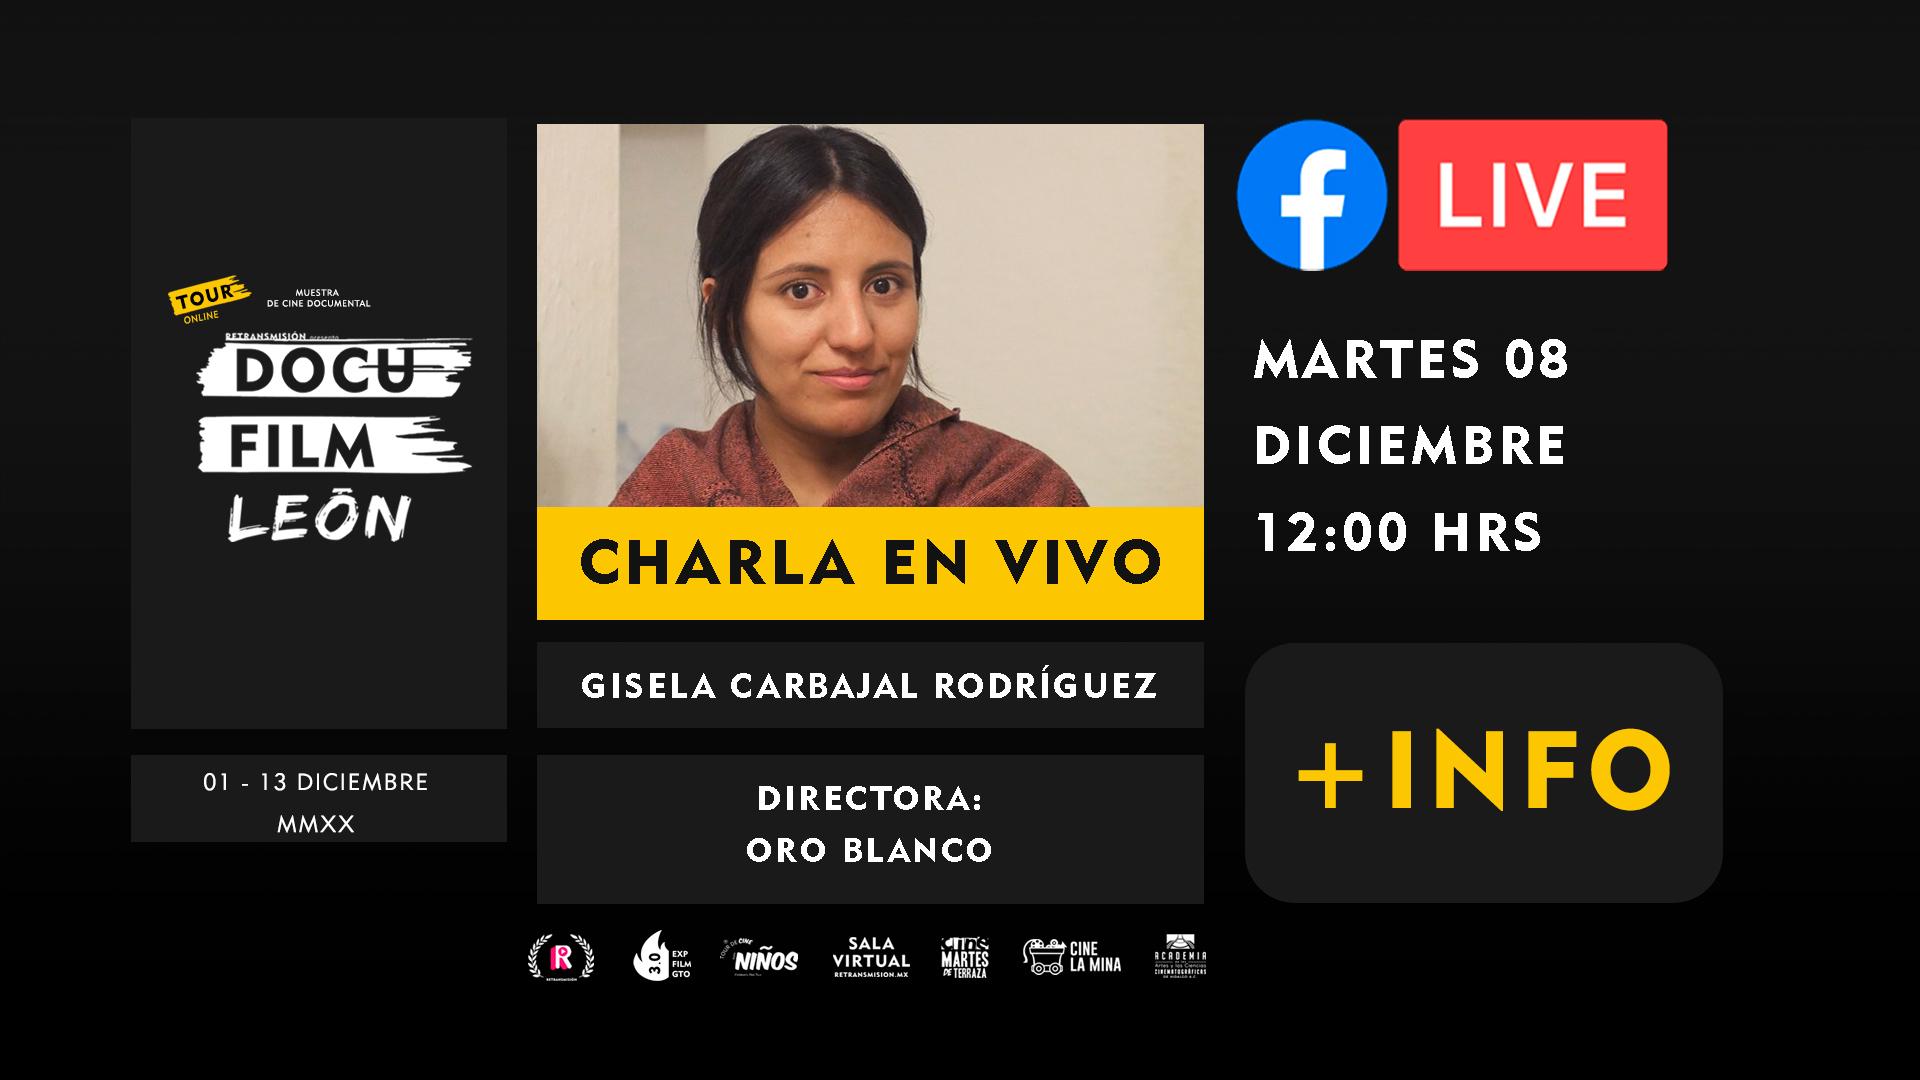 DIRECTORES-charlas+GISELA-CARBAJAL-DOCU-FILM-LEON-HORIZONTAL